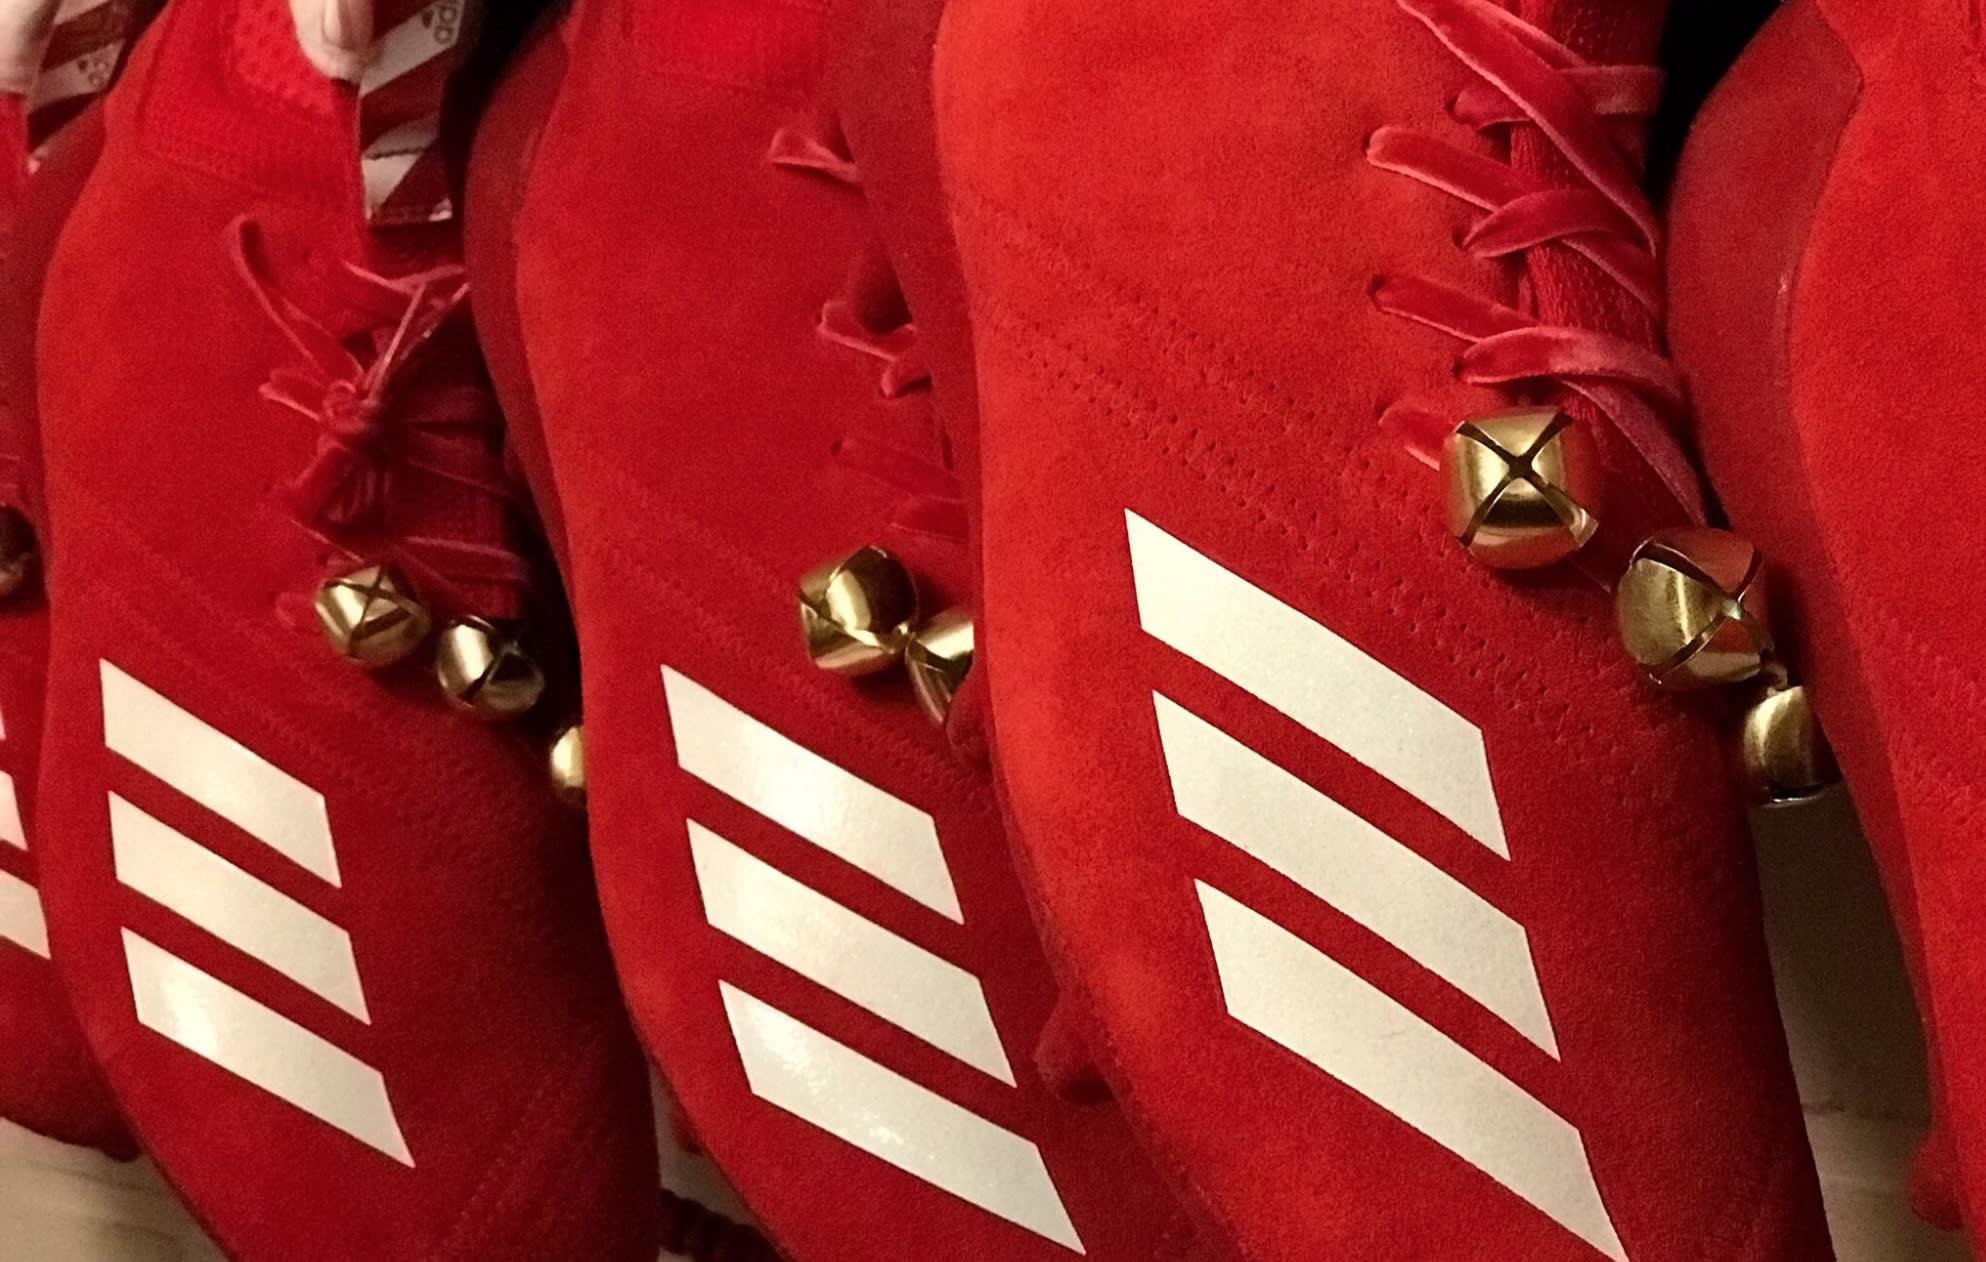 Adidas Football Christmas Stocking Cleats (3)